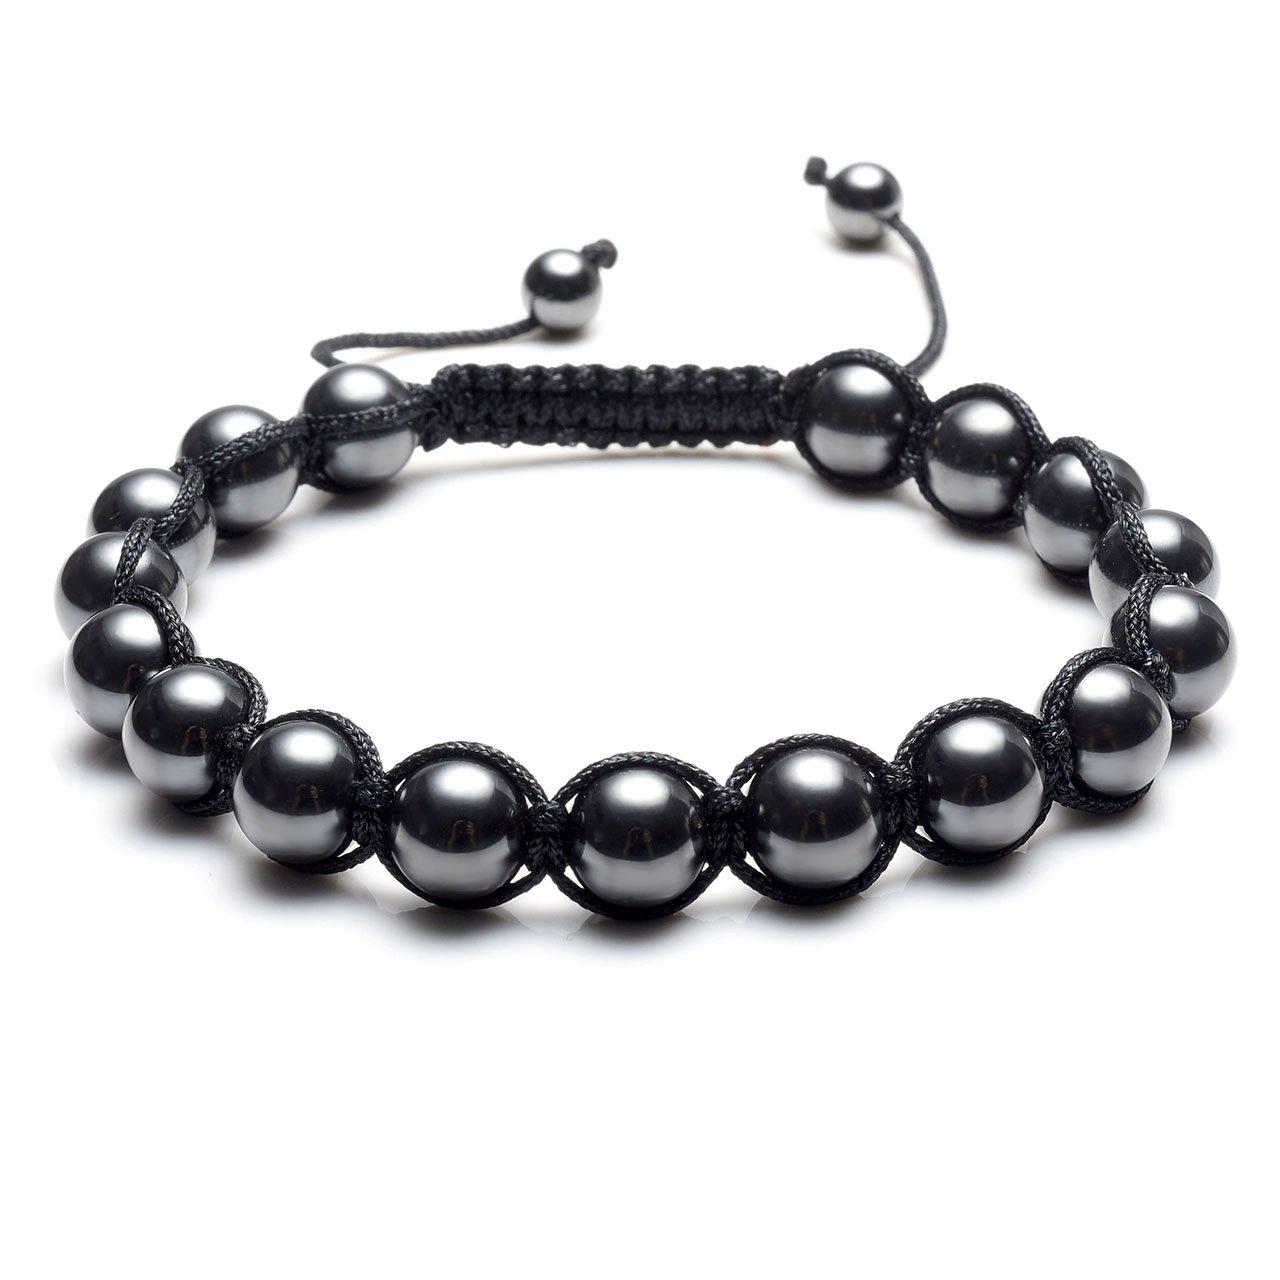 067c646cf2ac1 Top Plaza Men Women Reiki Healing Energy Natural Tiger Eye Stone Magnetic  Hematite Therapy Beads Macrame Adjustable Braided Link Bracelet